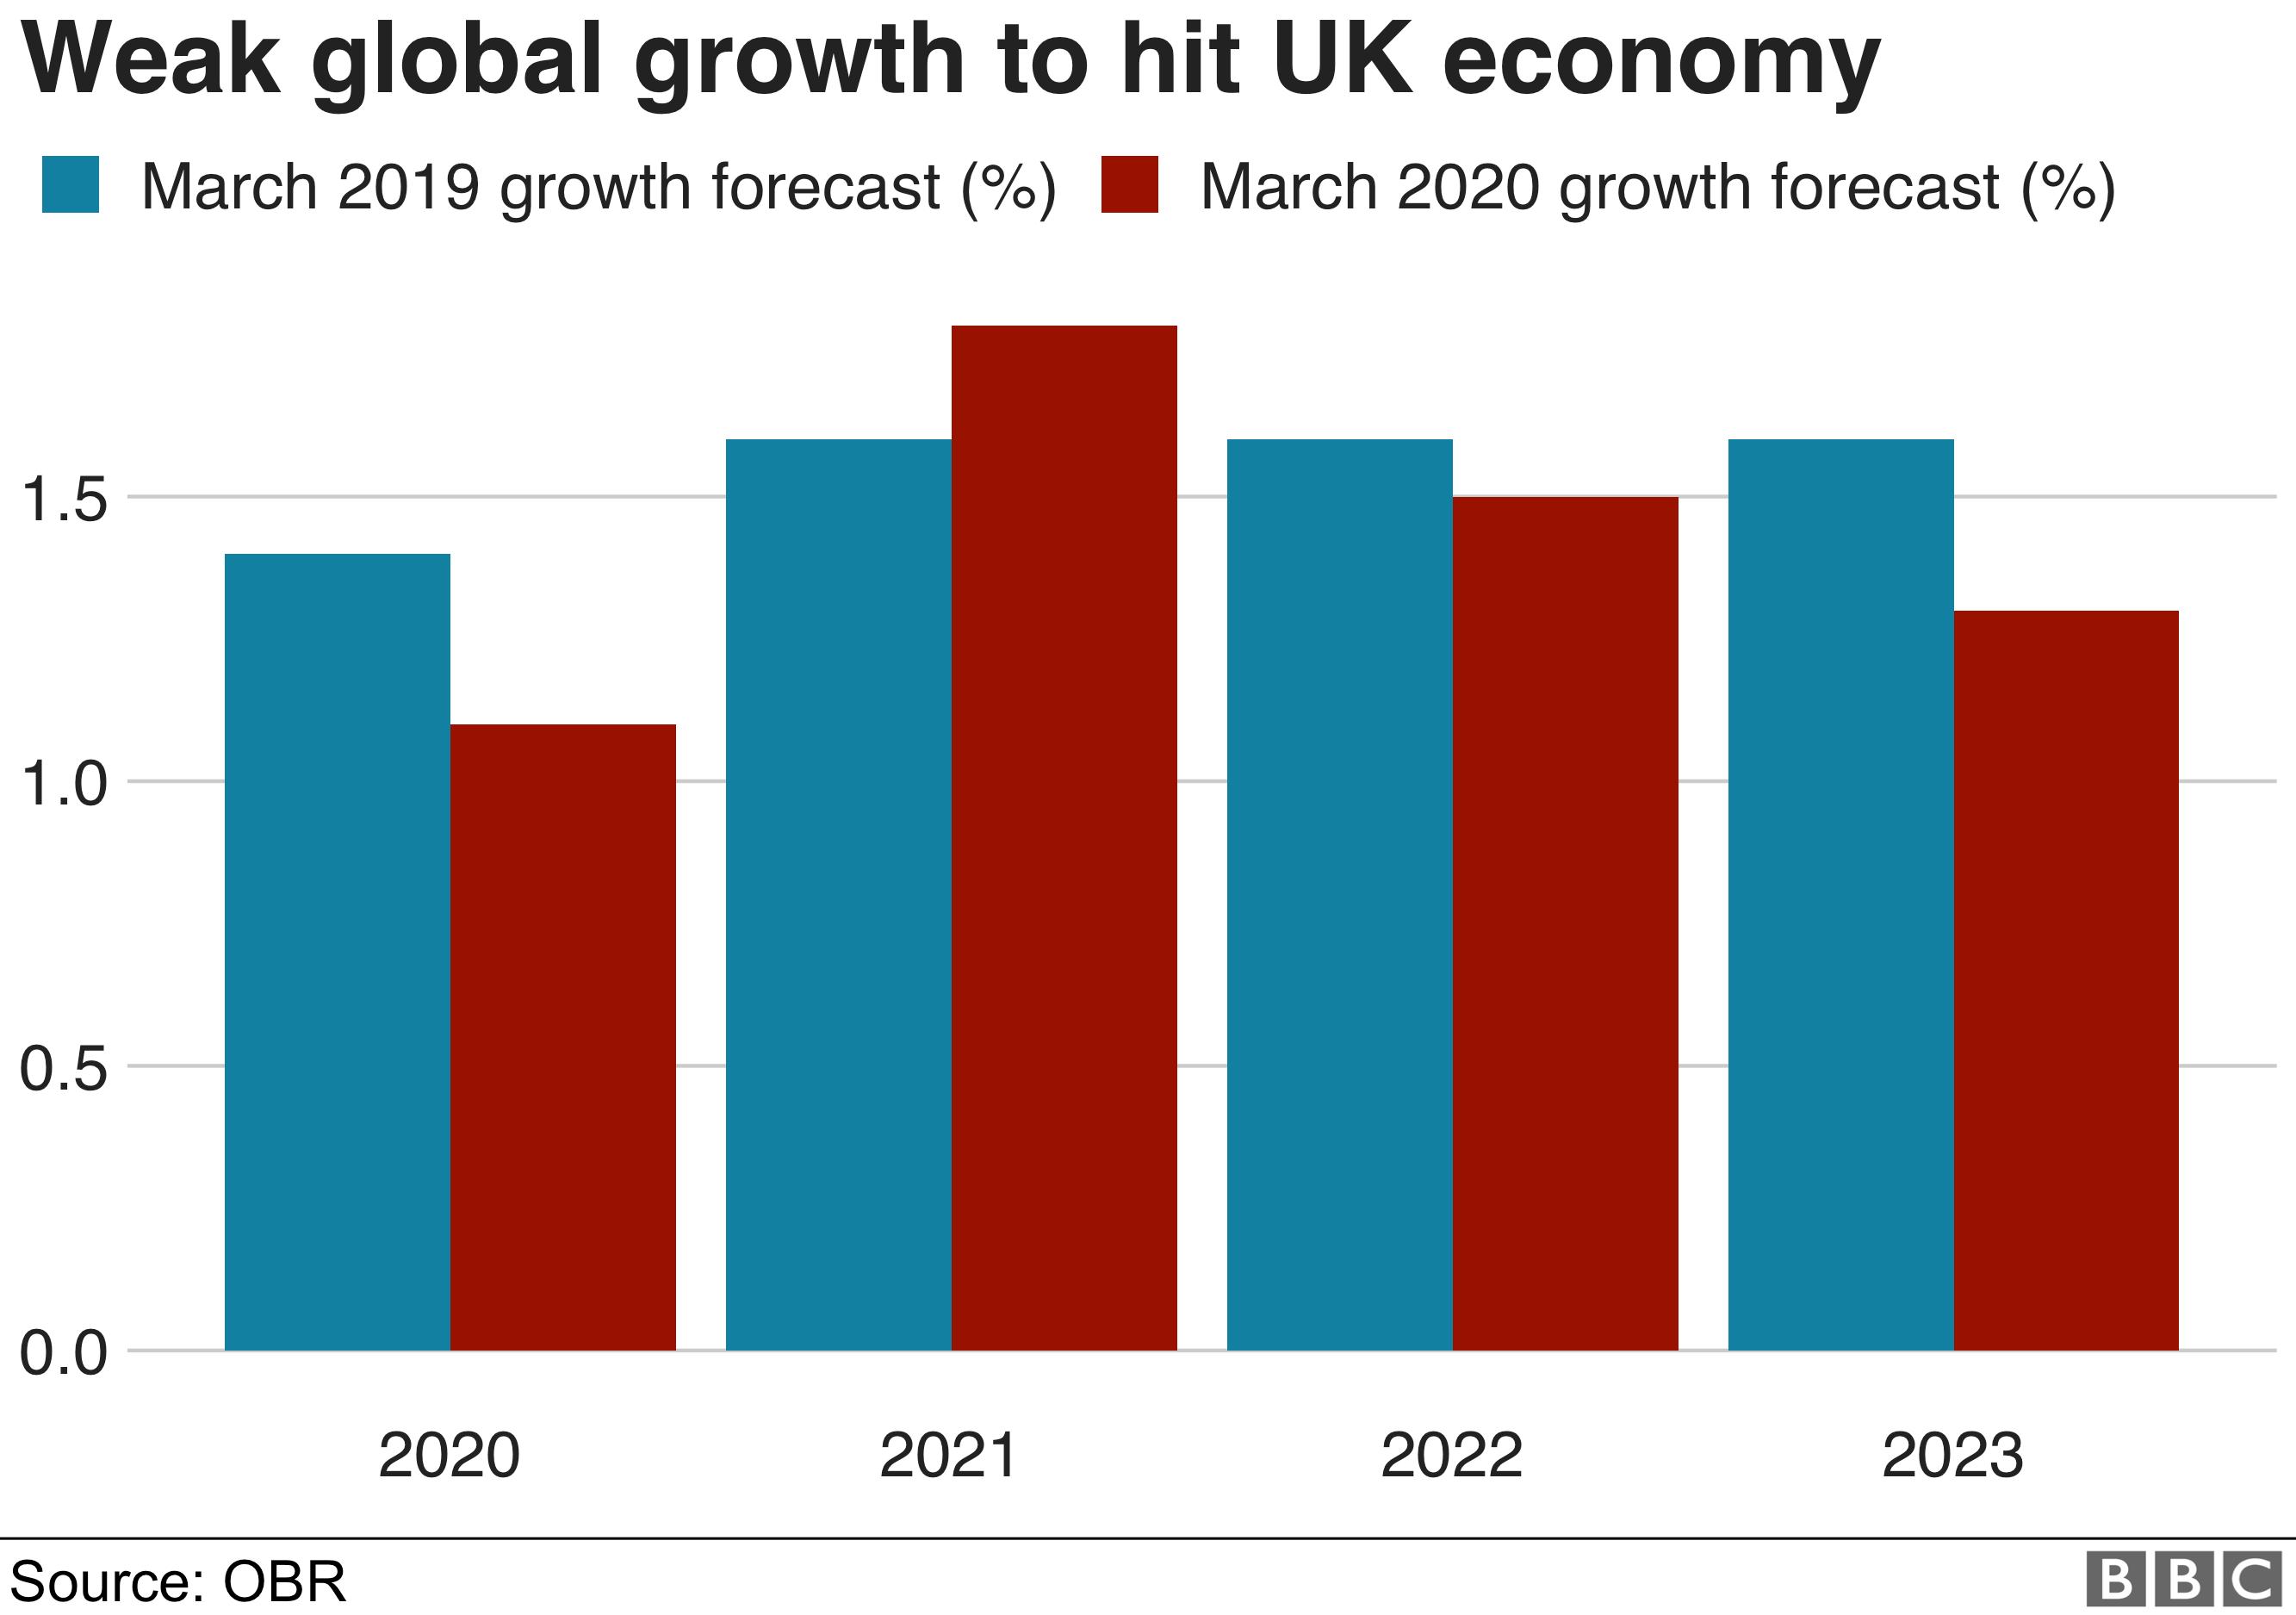 Budget 2020: UK public finances 'vulnerable' to borrowing shock